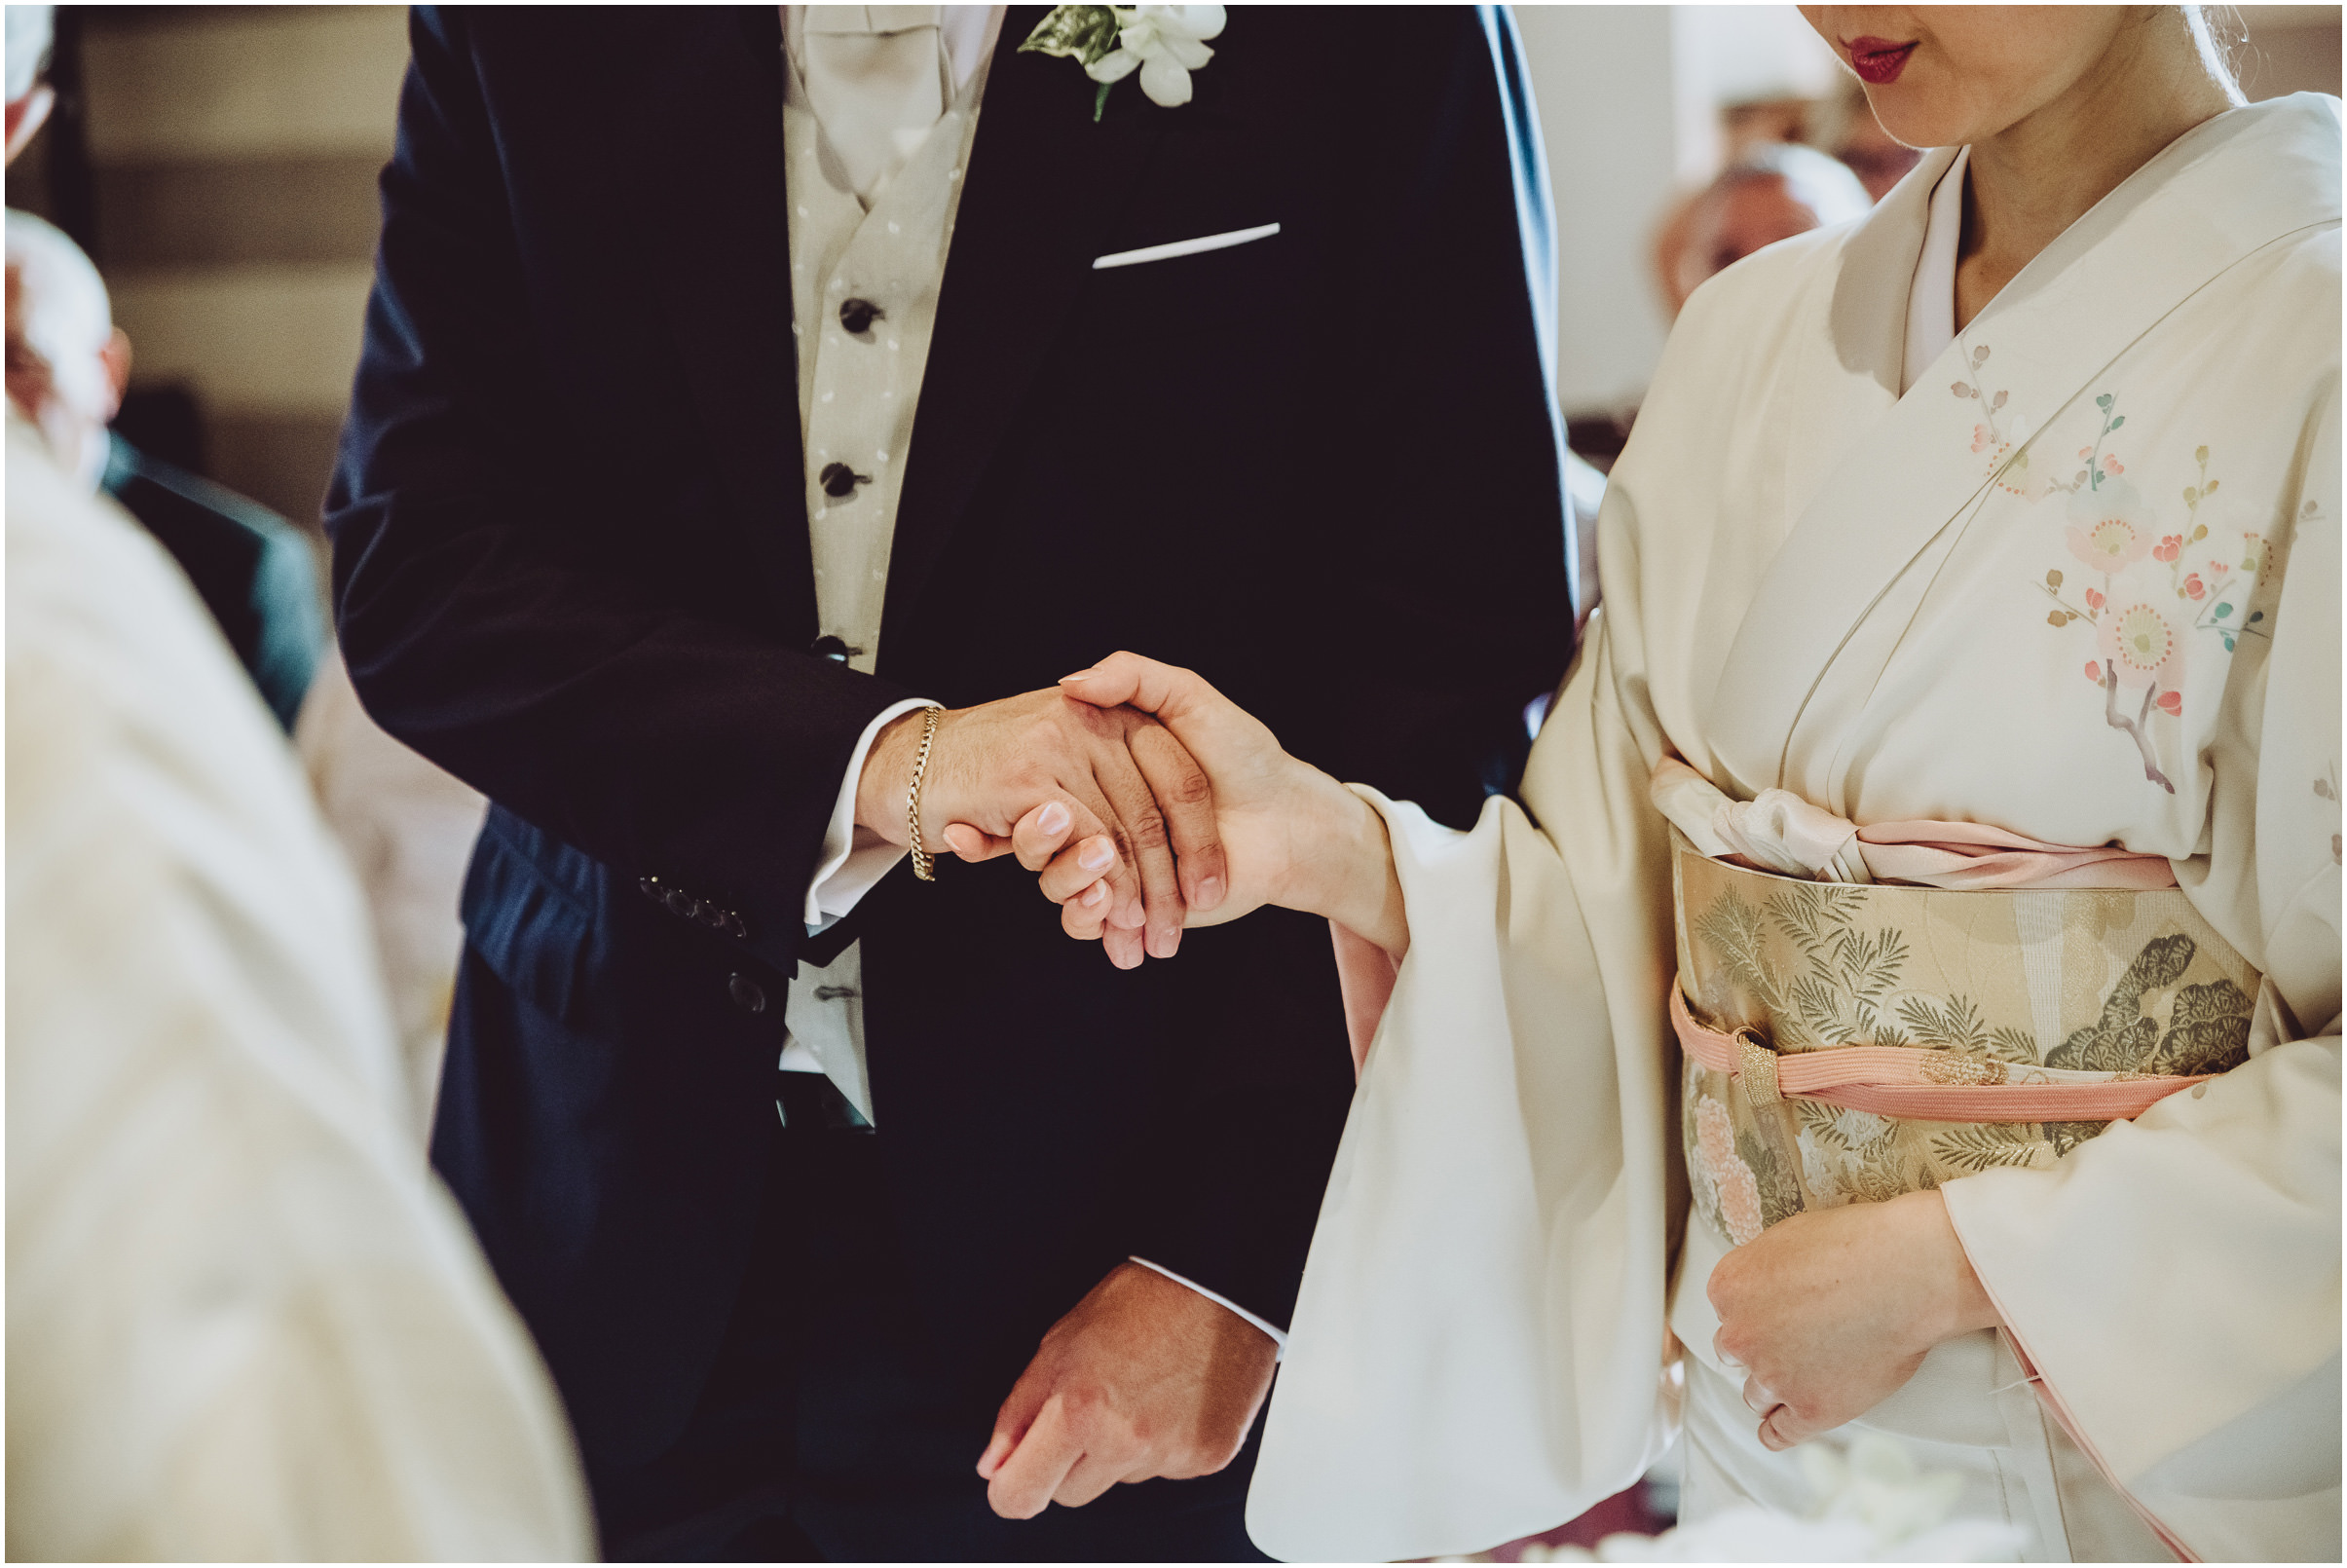 WEDDING-PHOTOGRAPHY-SARA-LORENZONI-FOTOGRAFIA-MATRIMONIO-ORVIETO-JUKA-ANTONELLO15